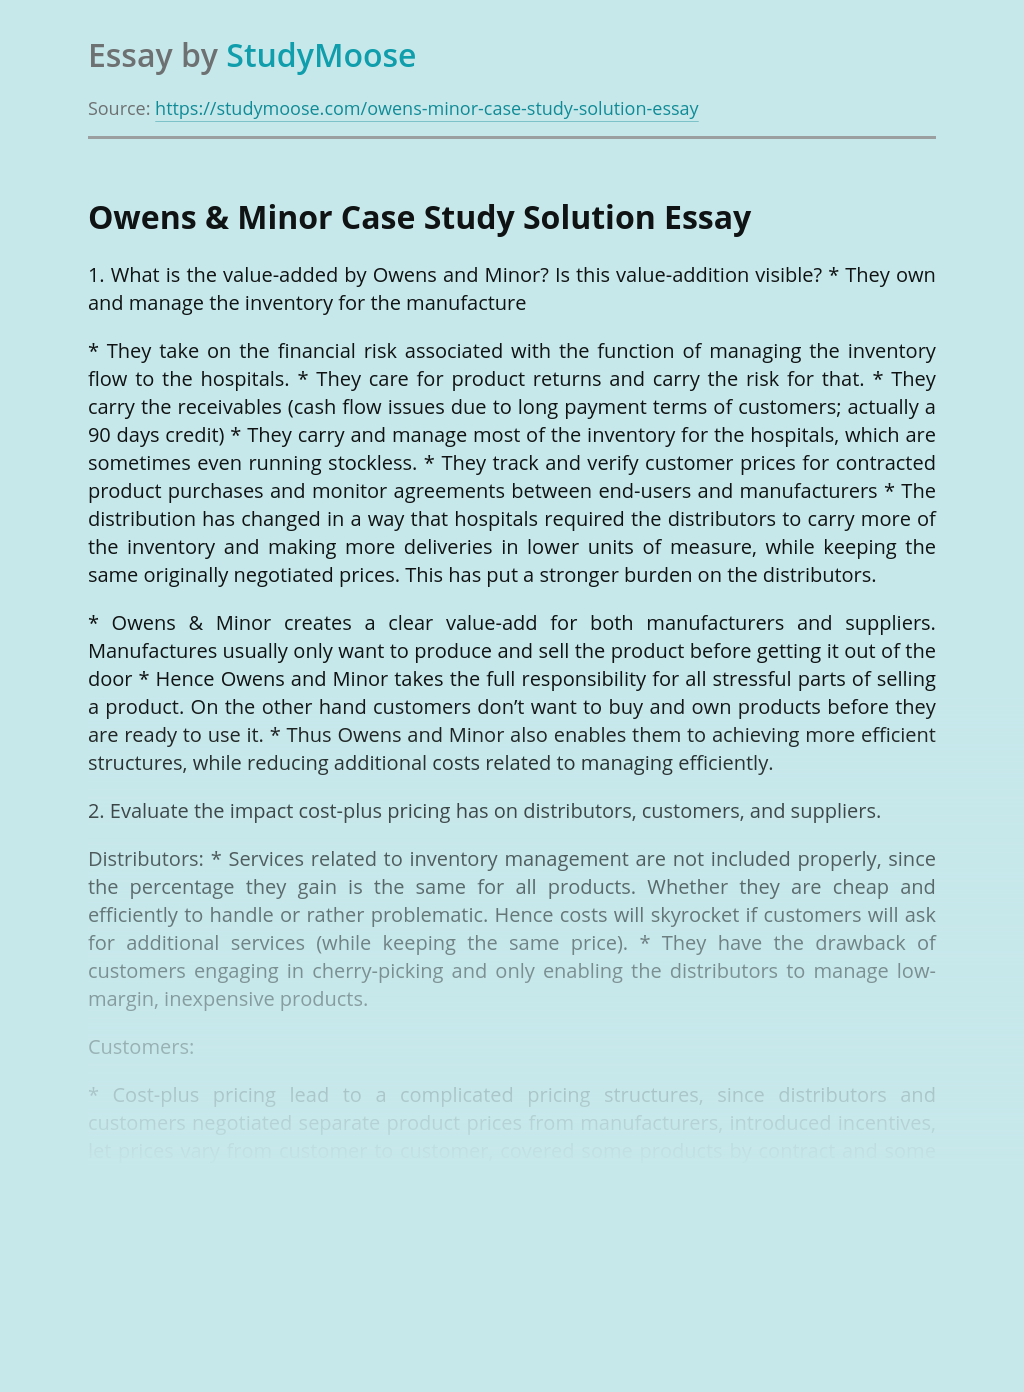 Owens & Minor Case Study Solution